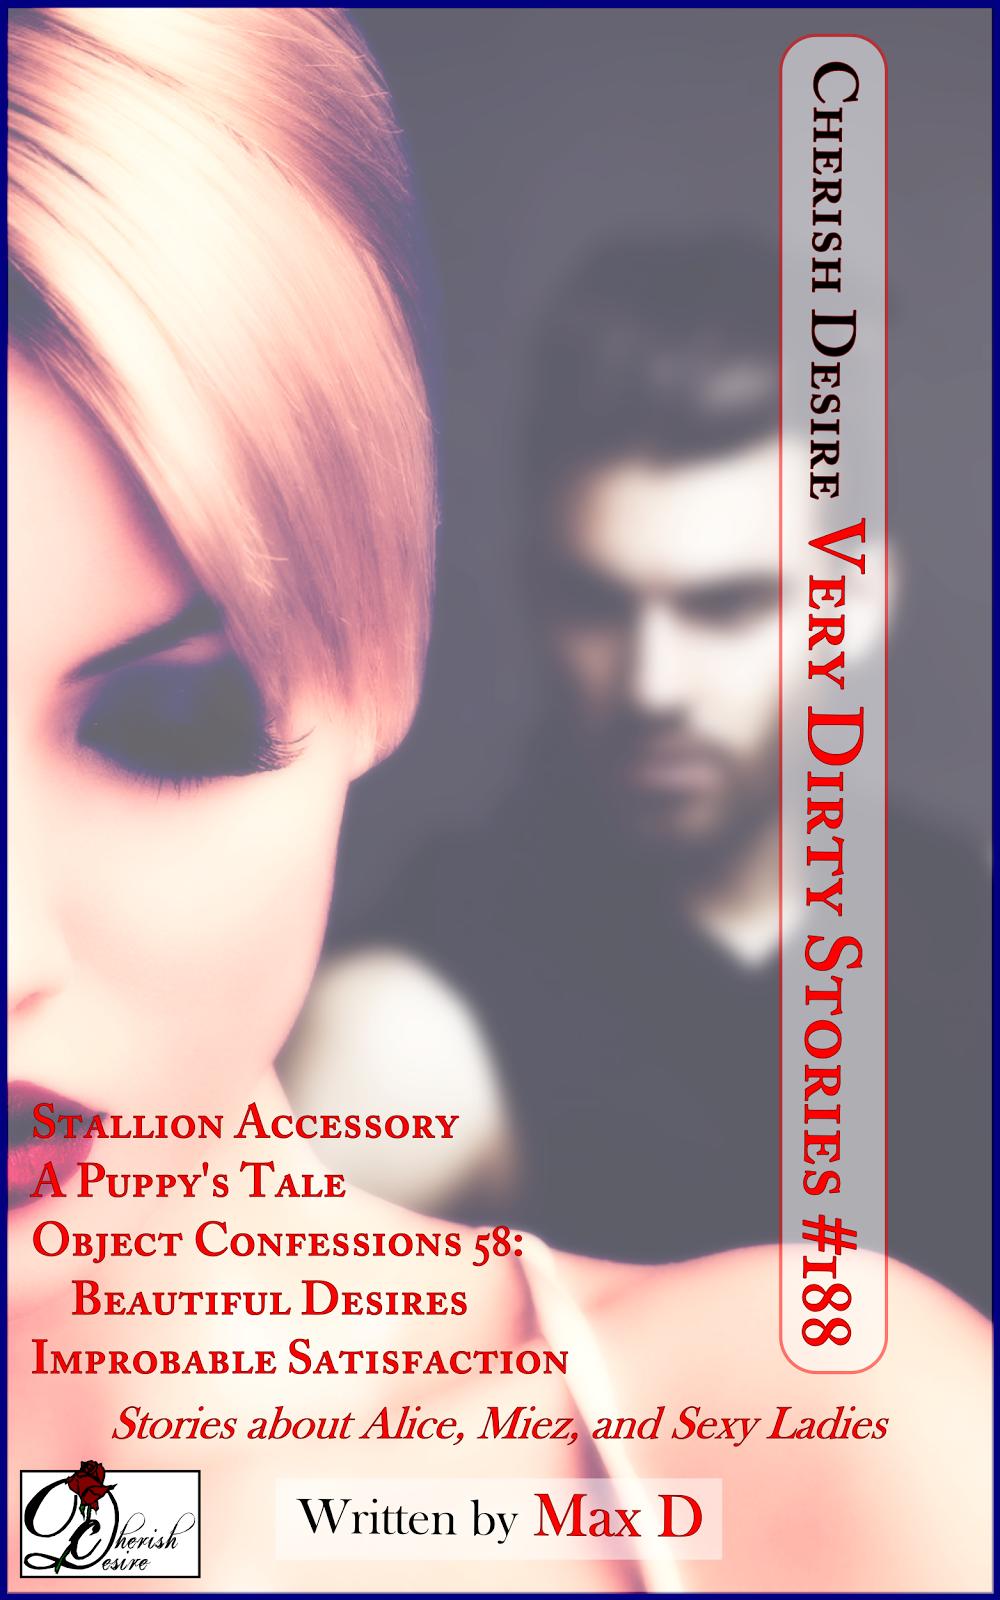 Cherish Desire: Very Dirty Stories #188, Max D, erotica